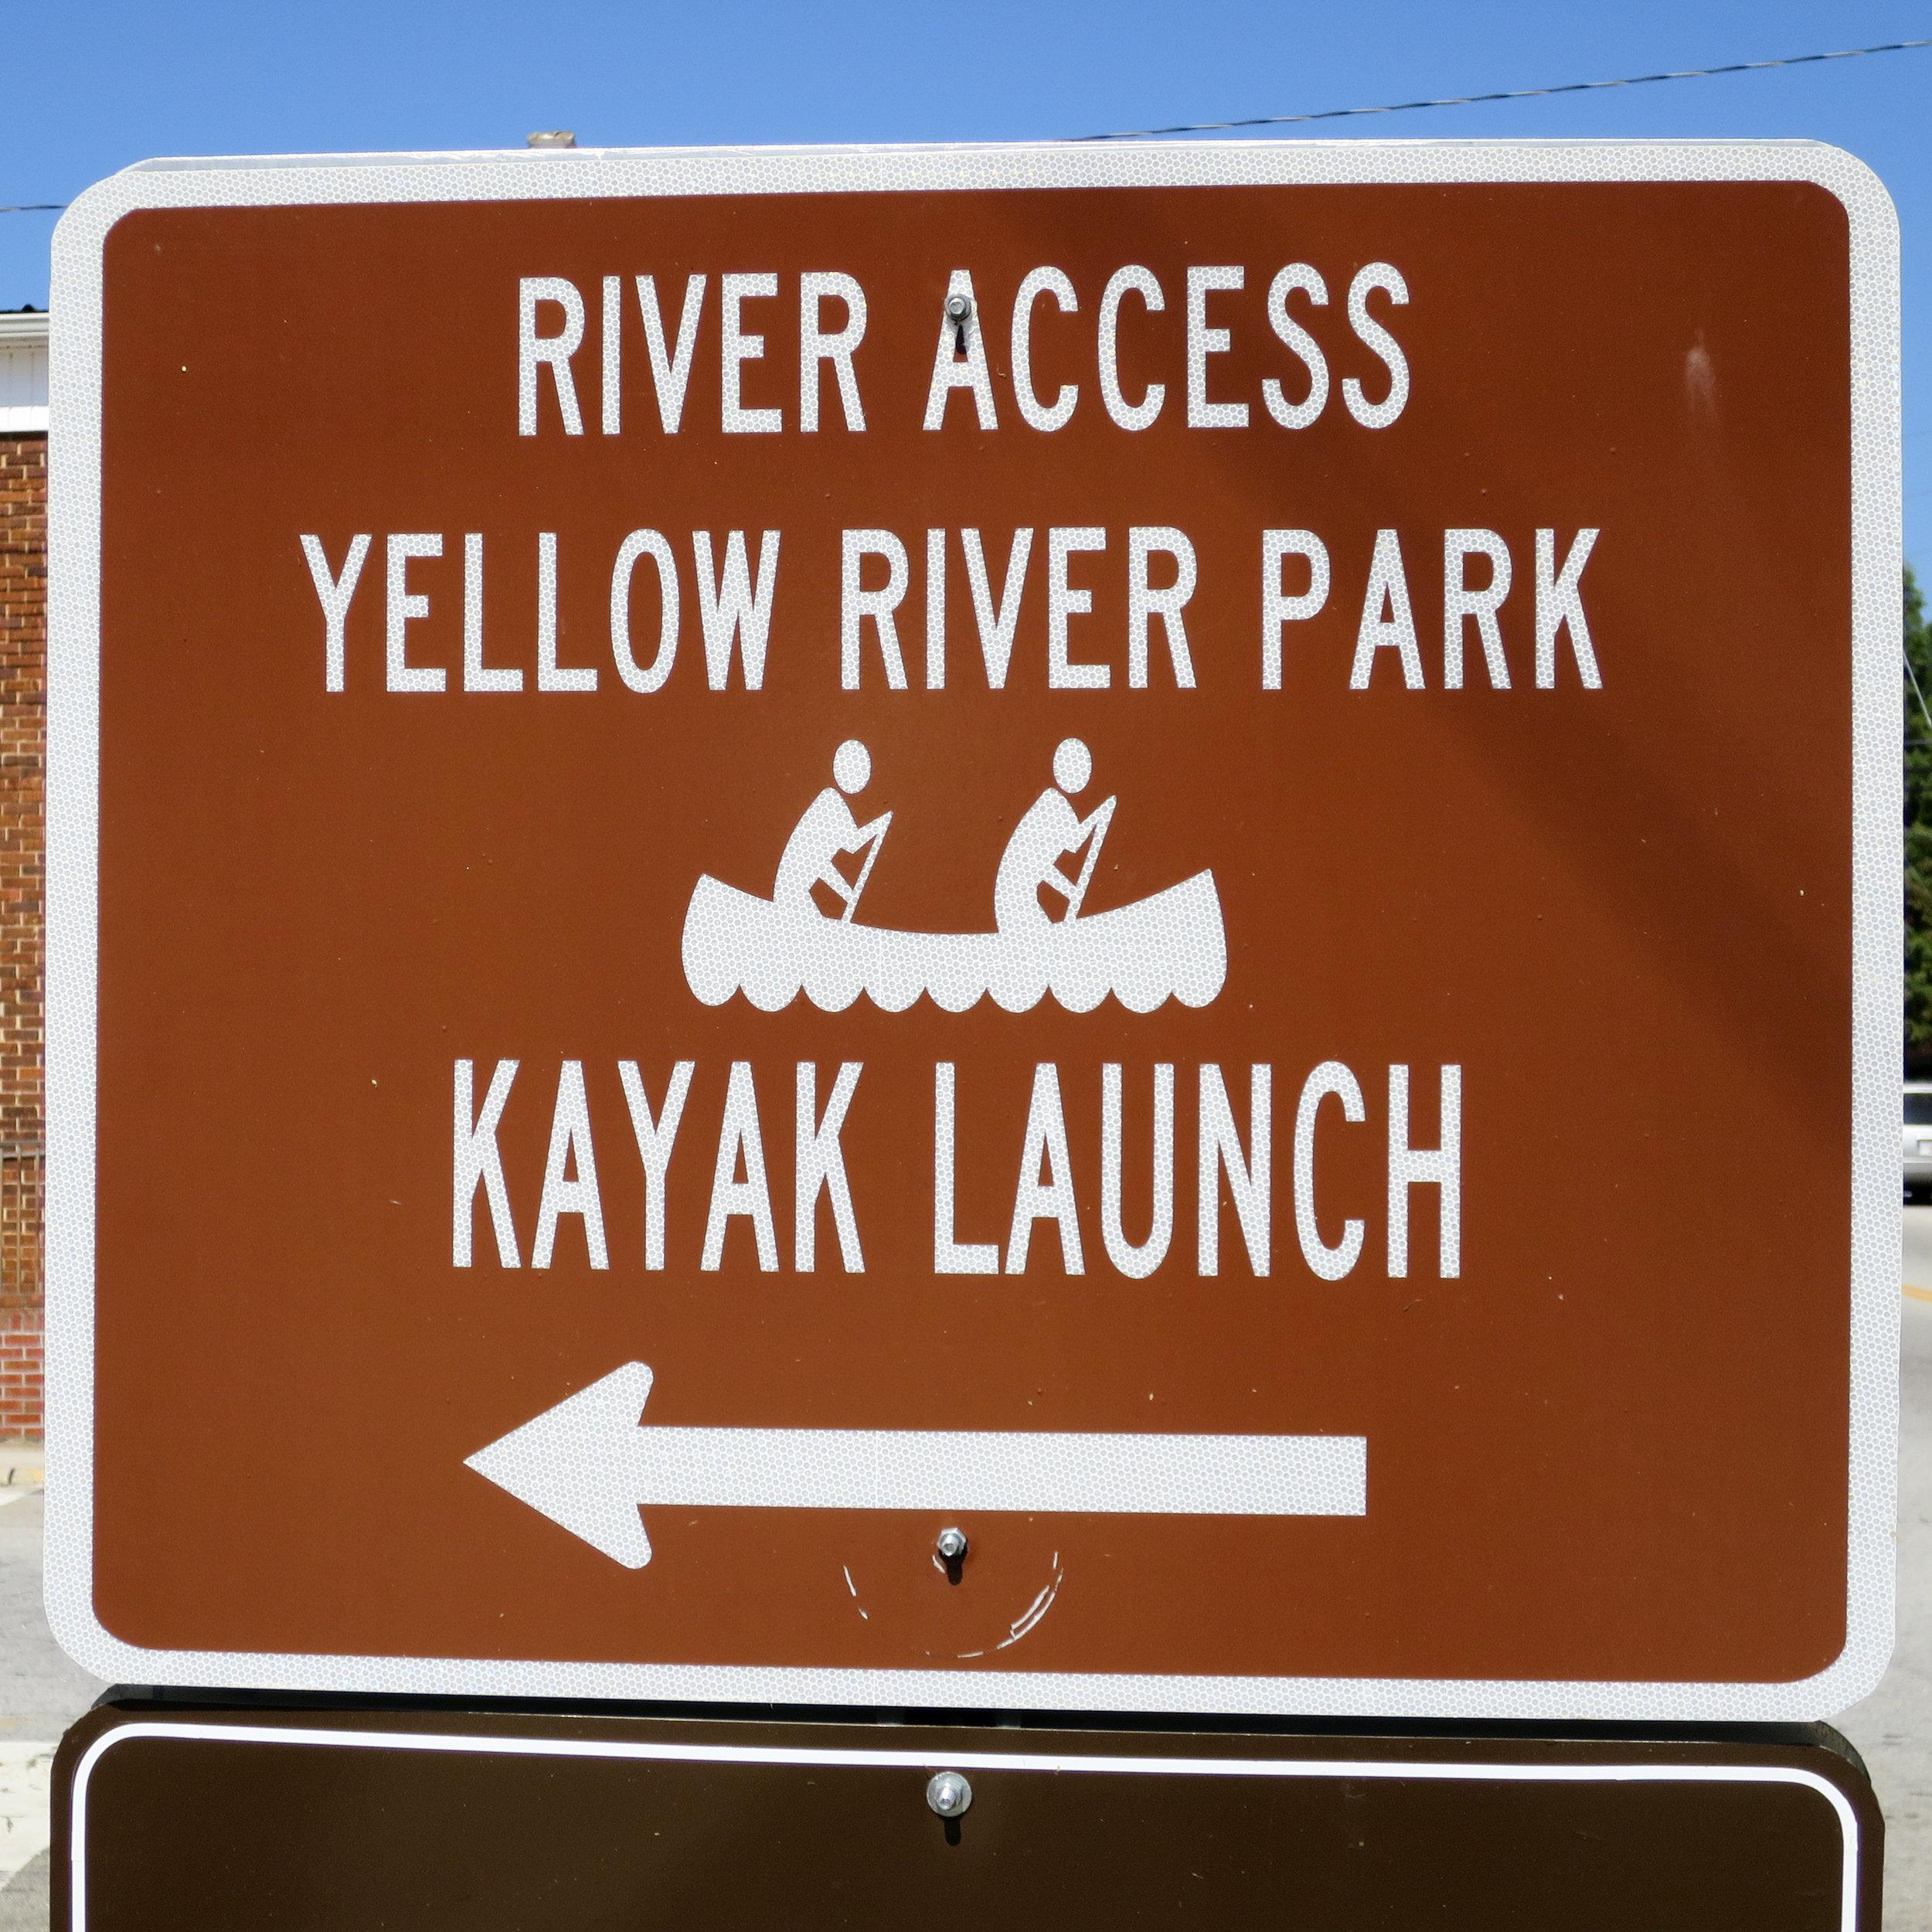 Yellow River Water Trail in Porterdale, GA